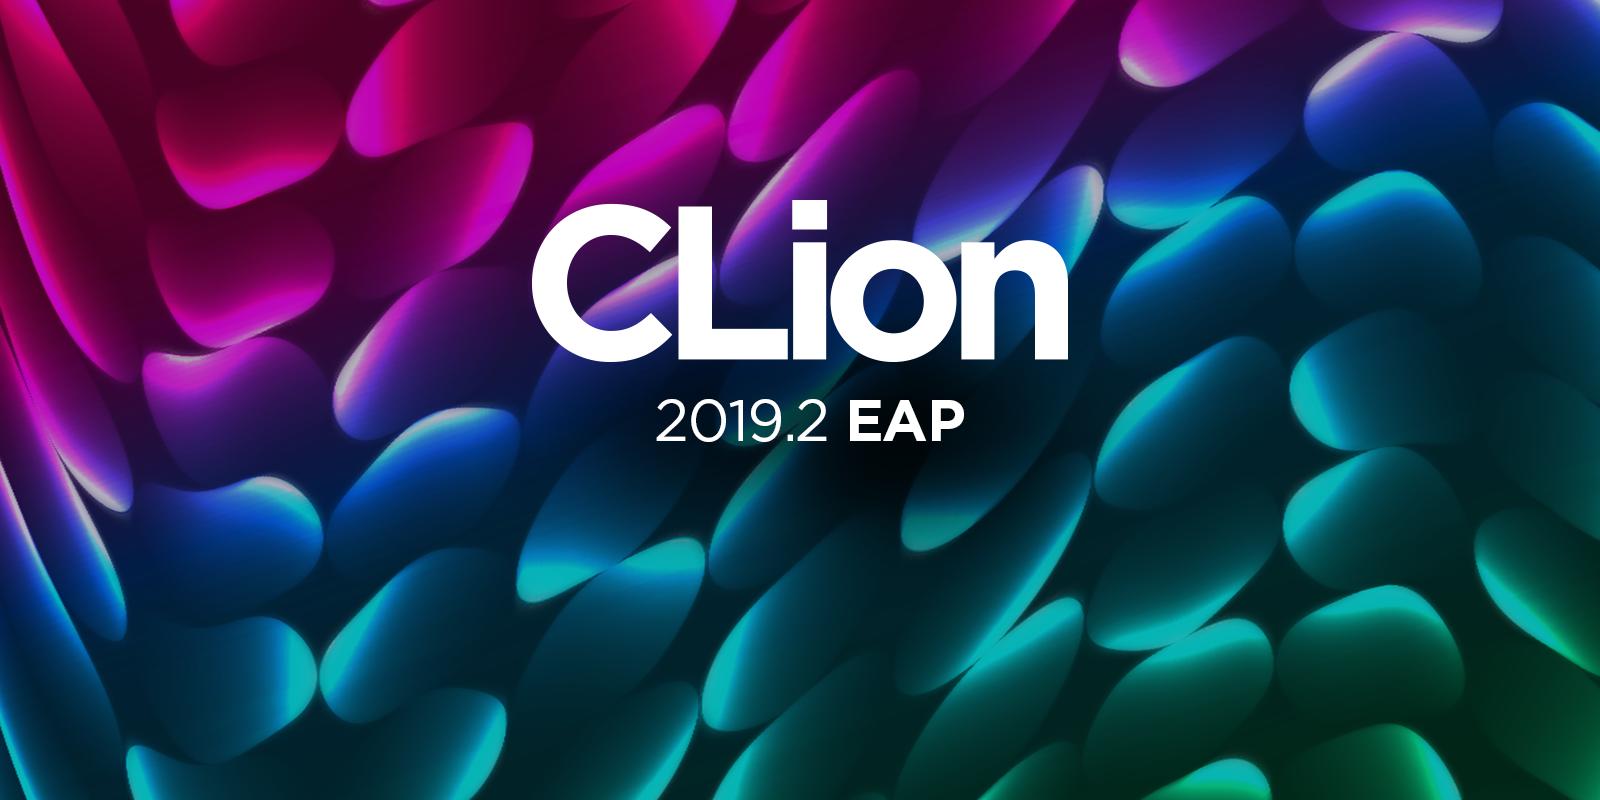 CLion 2019.2 EAP starts